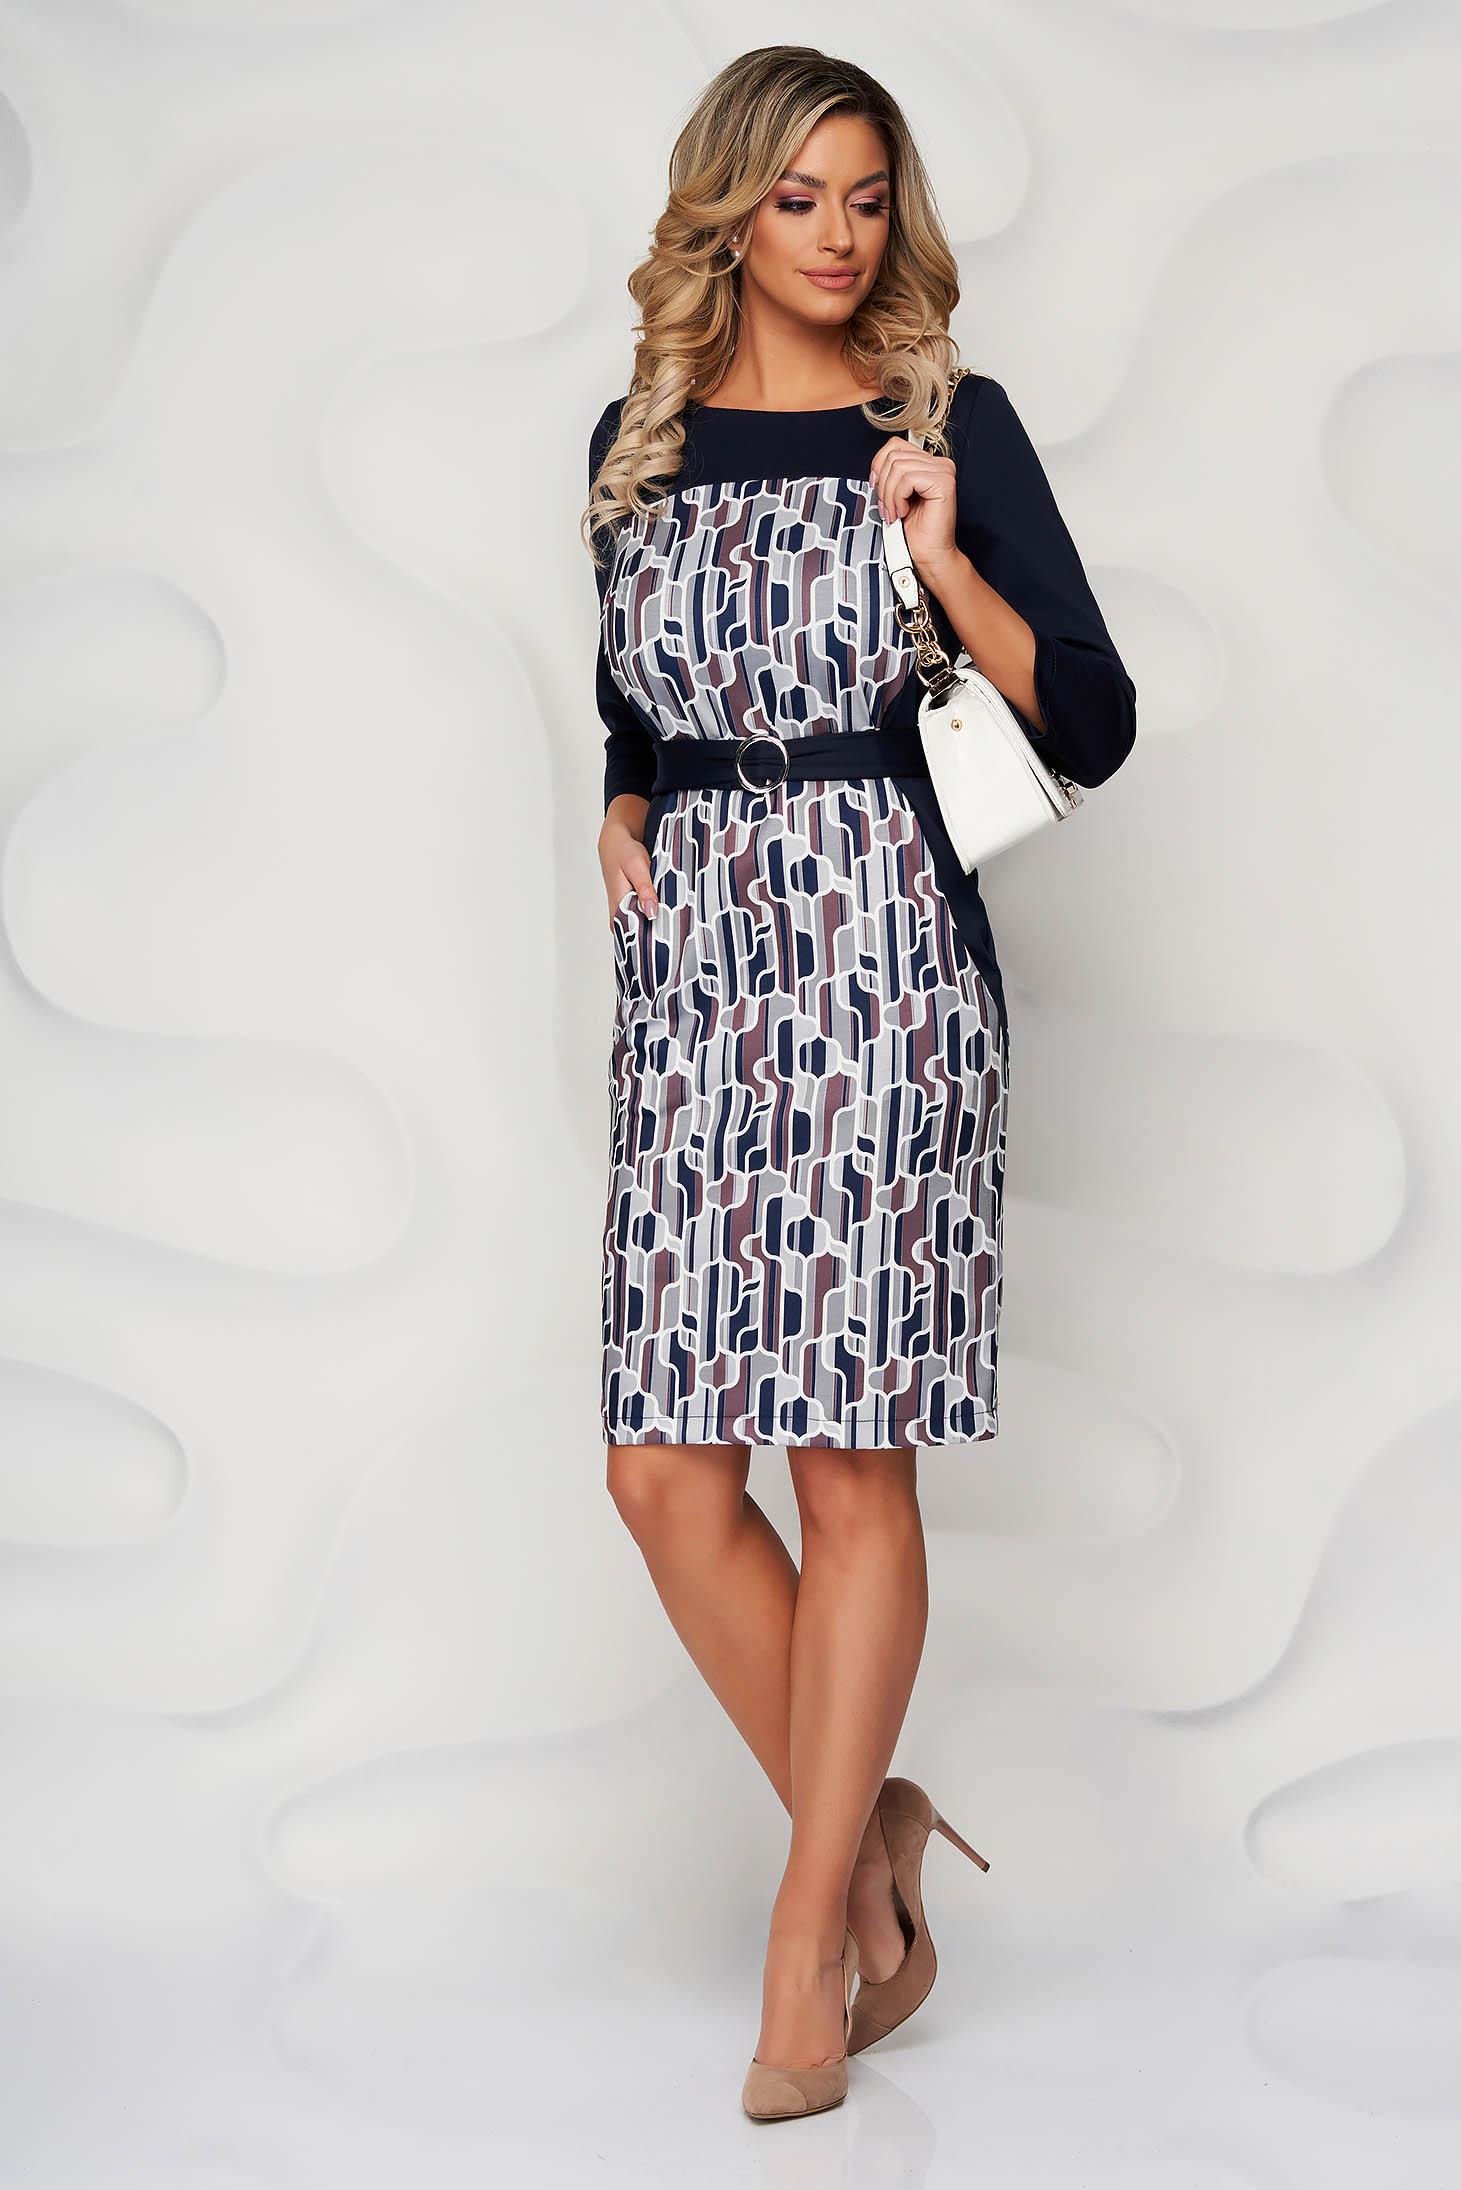 StarShinerS darkblue dress midi pencil with graphic details slightly elastic fabric